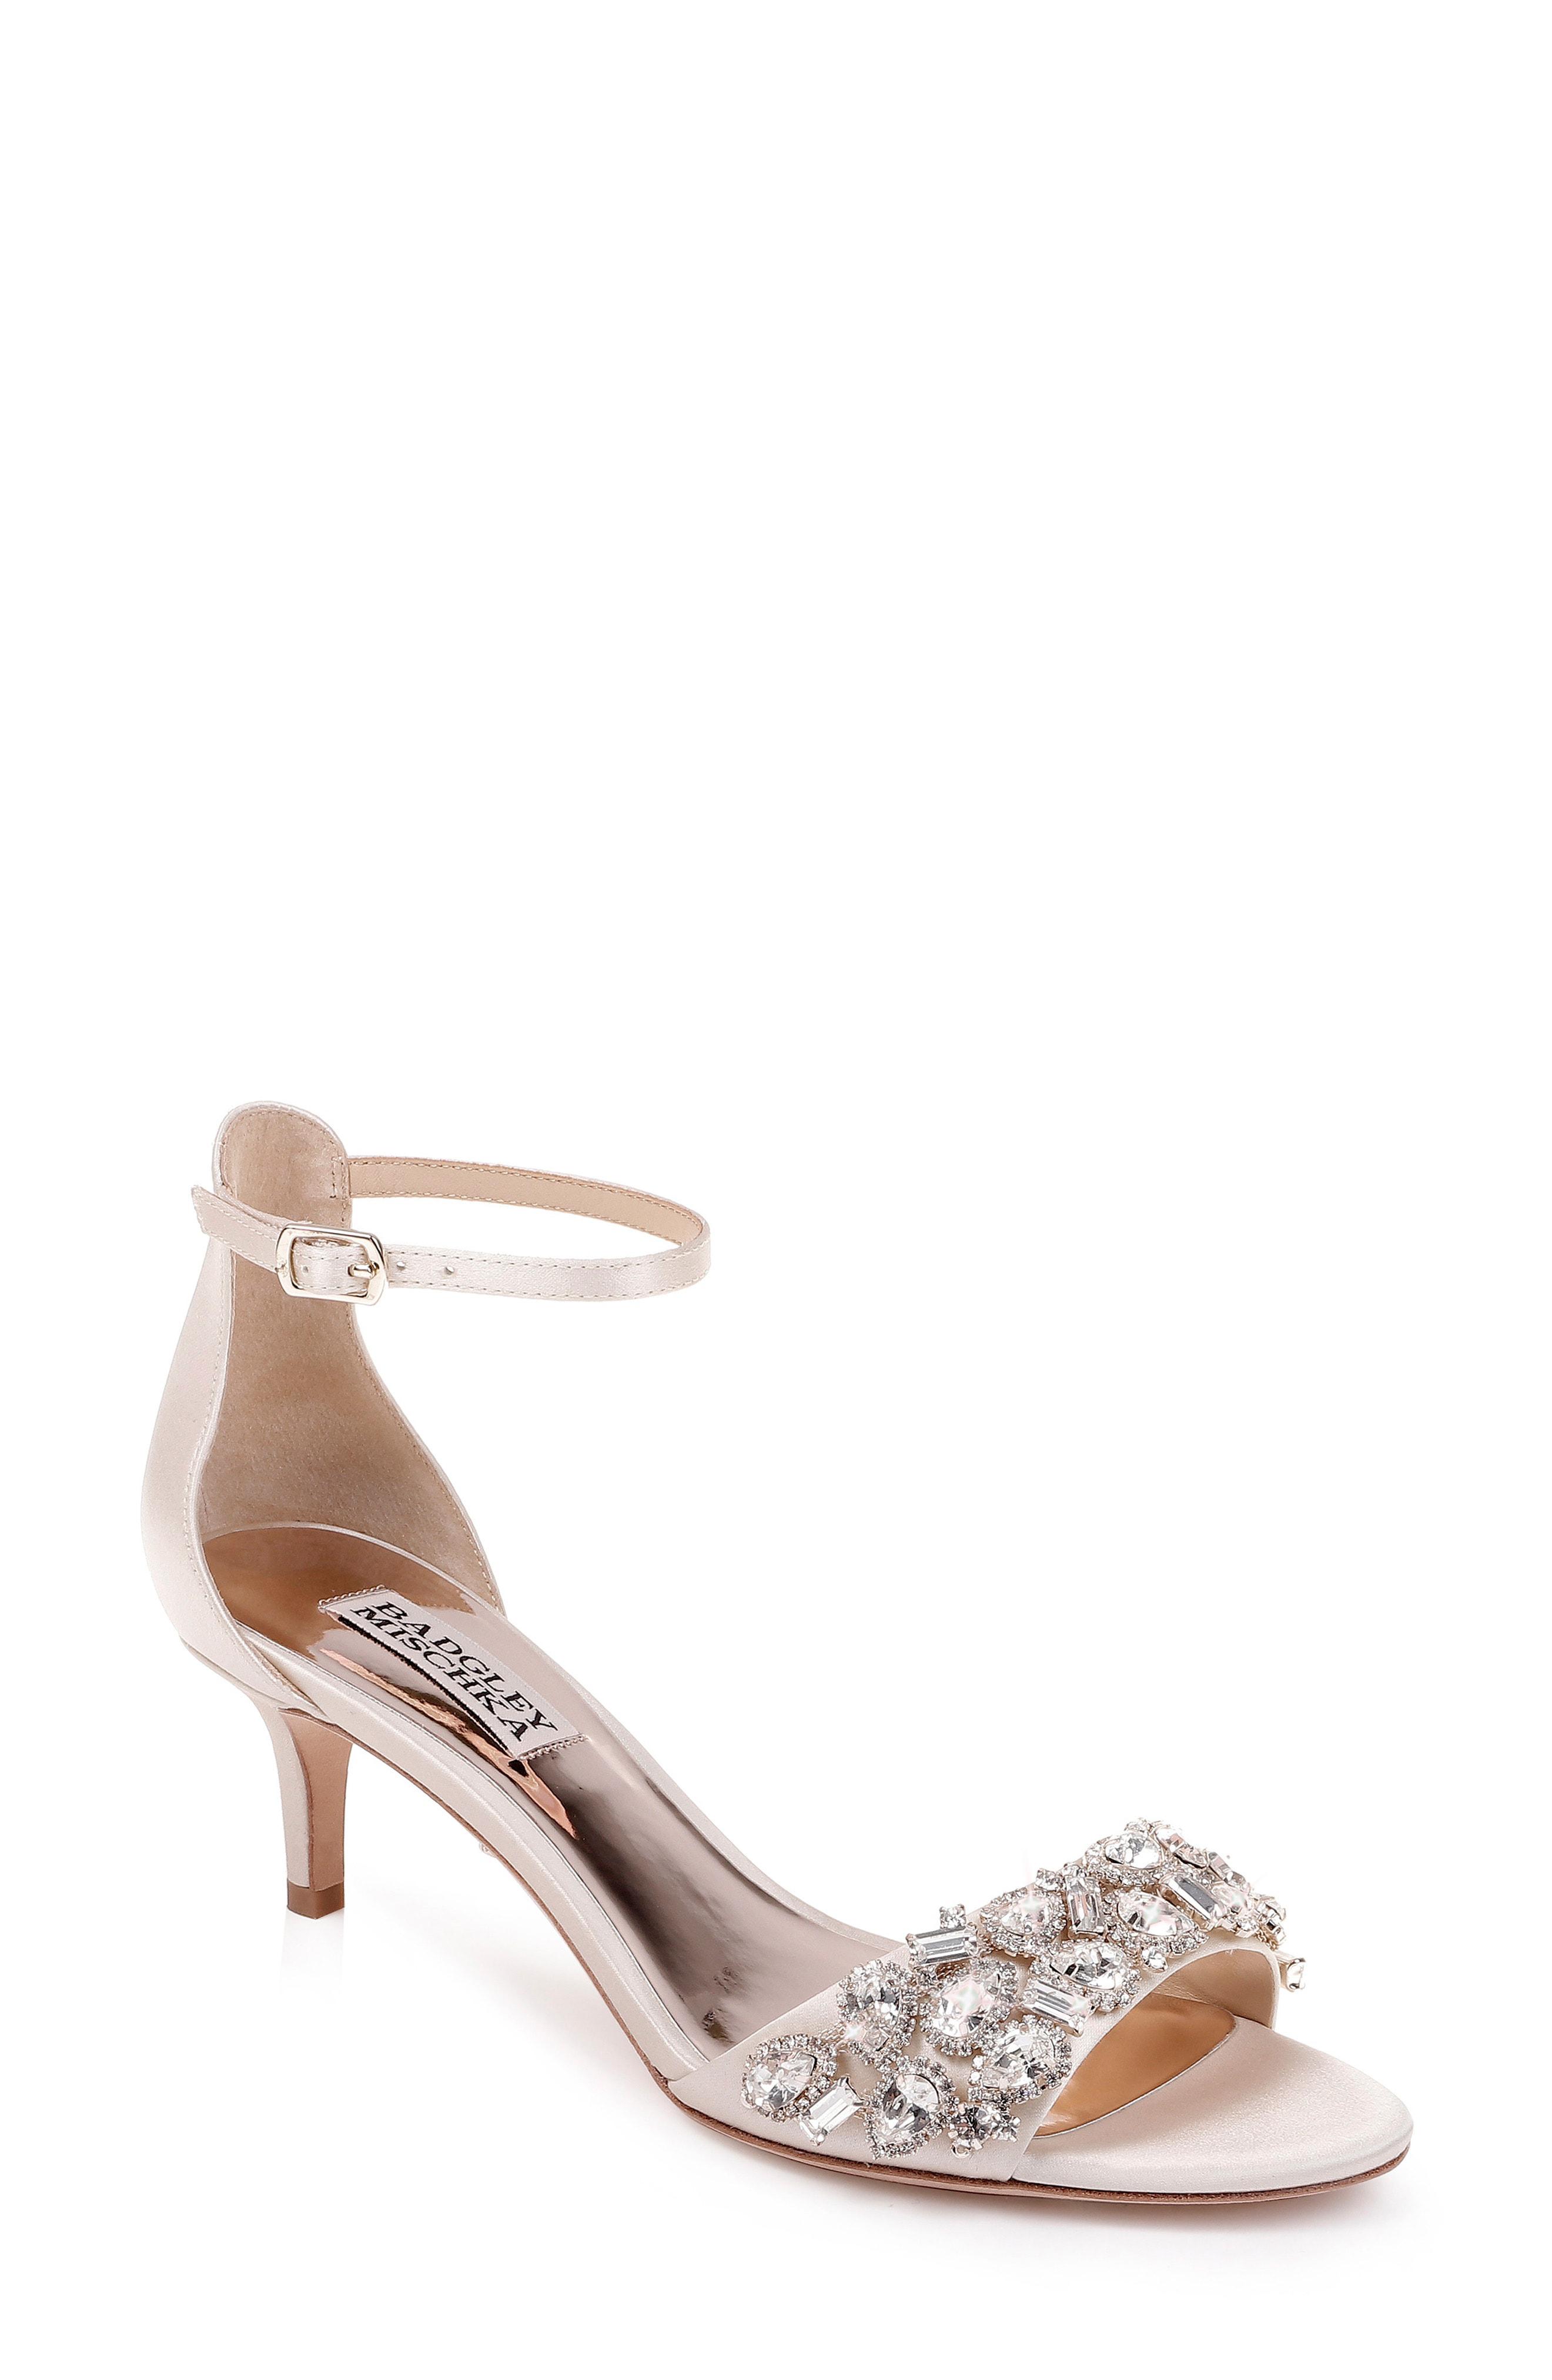 1004f9ad1 Badgley Mischka Women s Lara Embellished Kitten Heel Sandals In Ivory Satin